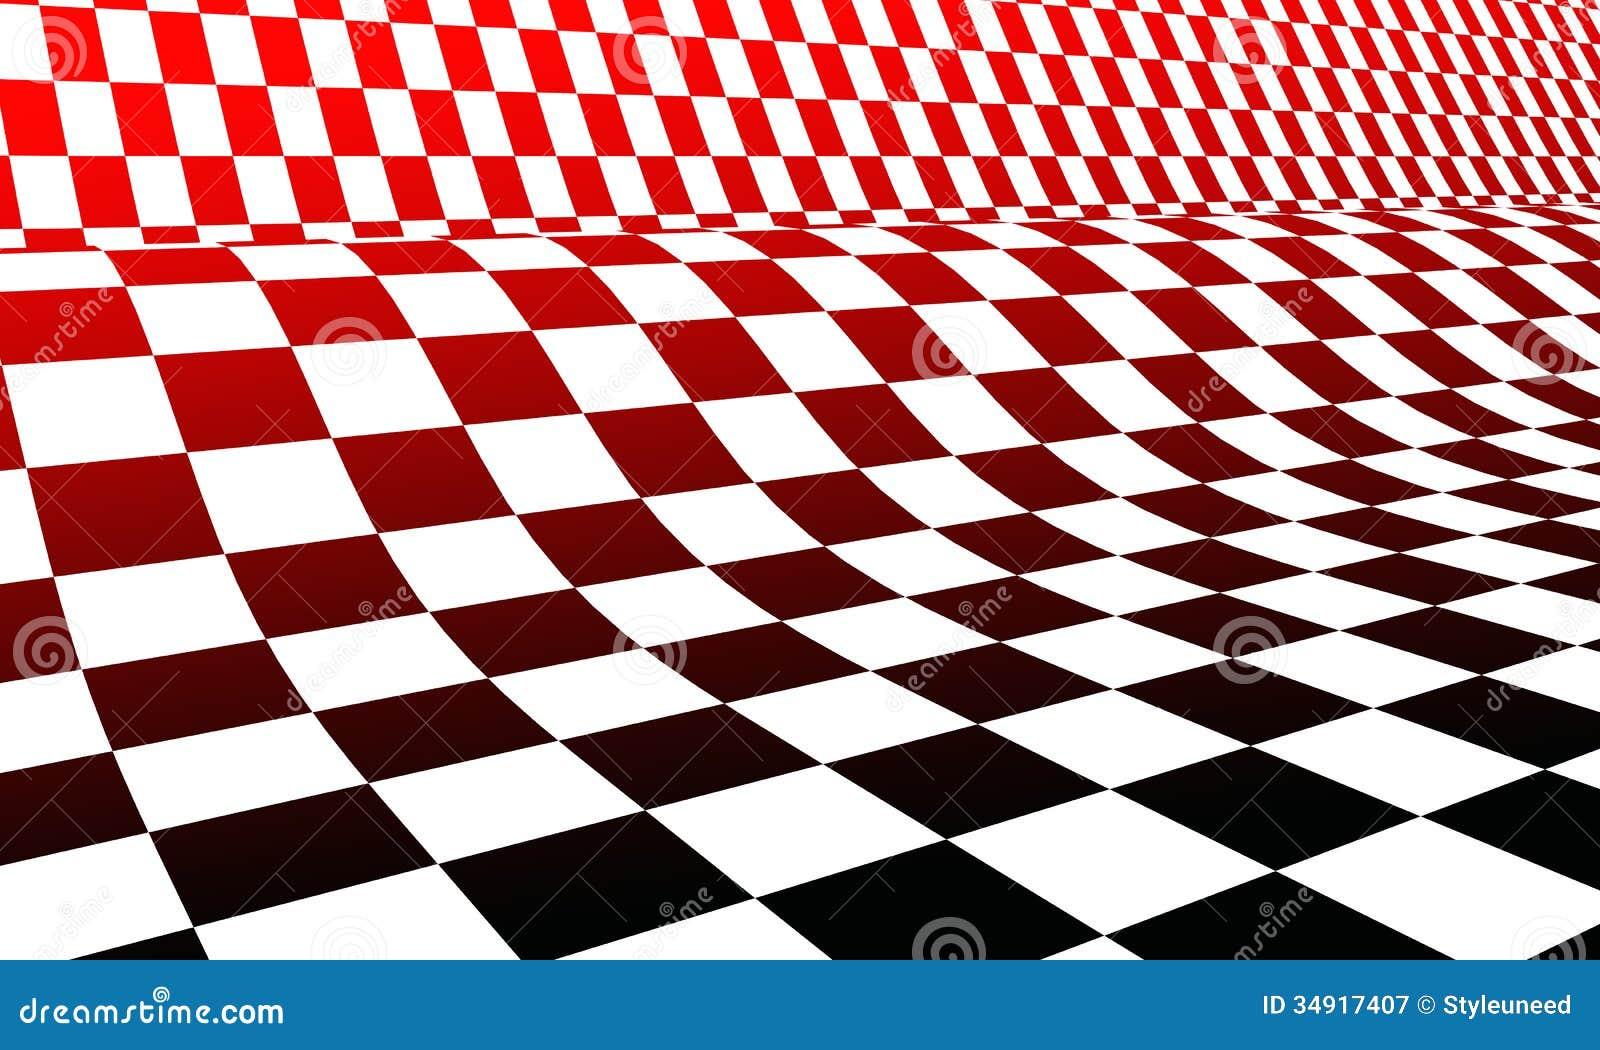 51ffc153e89 Red White And Black Checkerboard Stock Illustration - Illustration ...